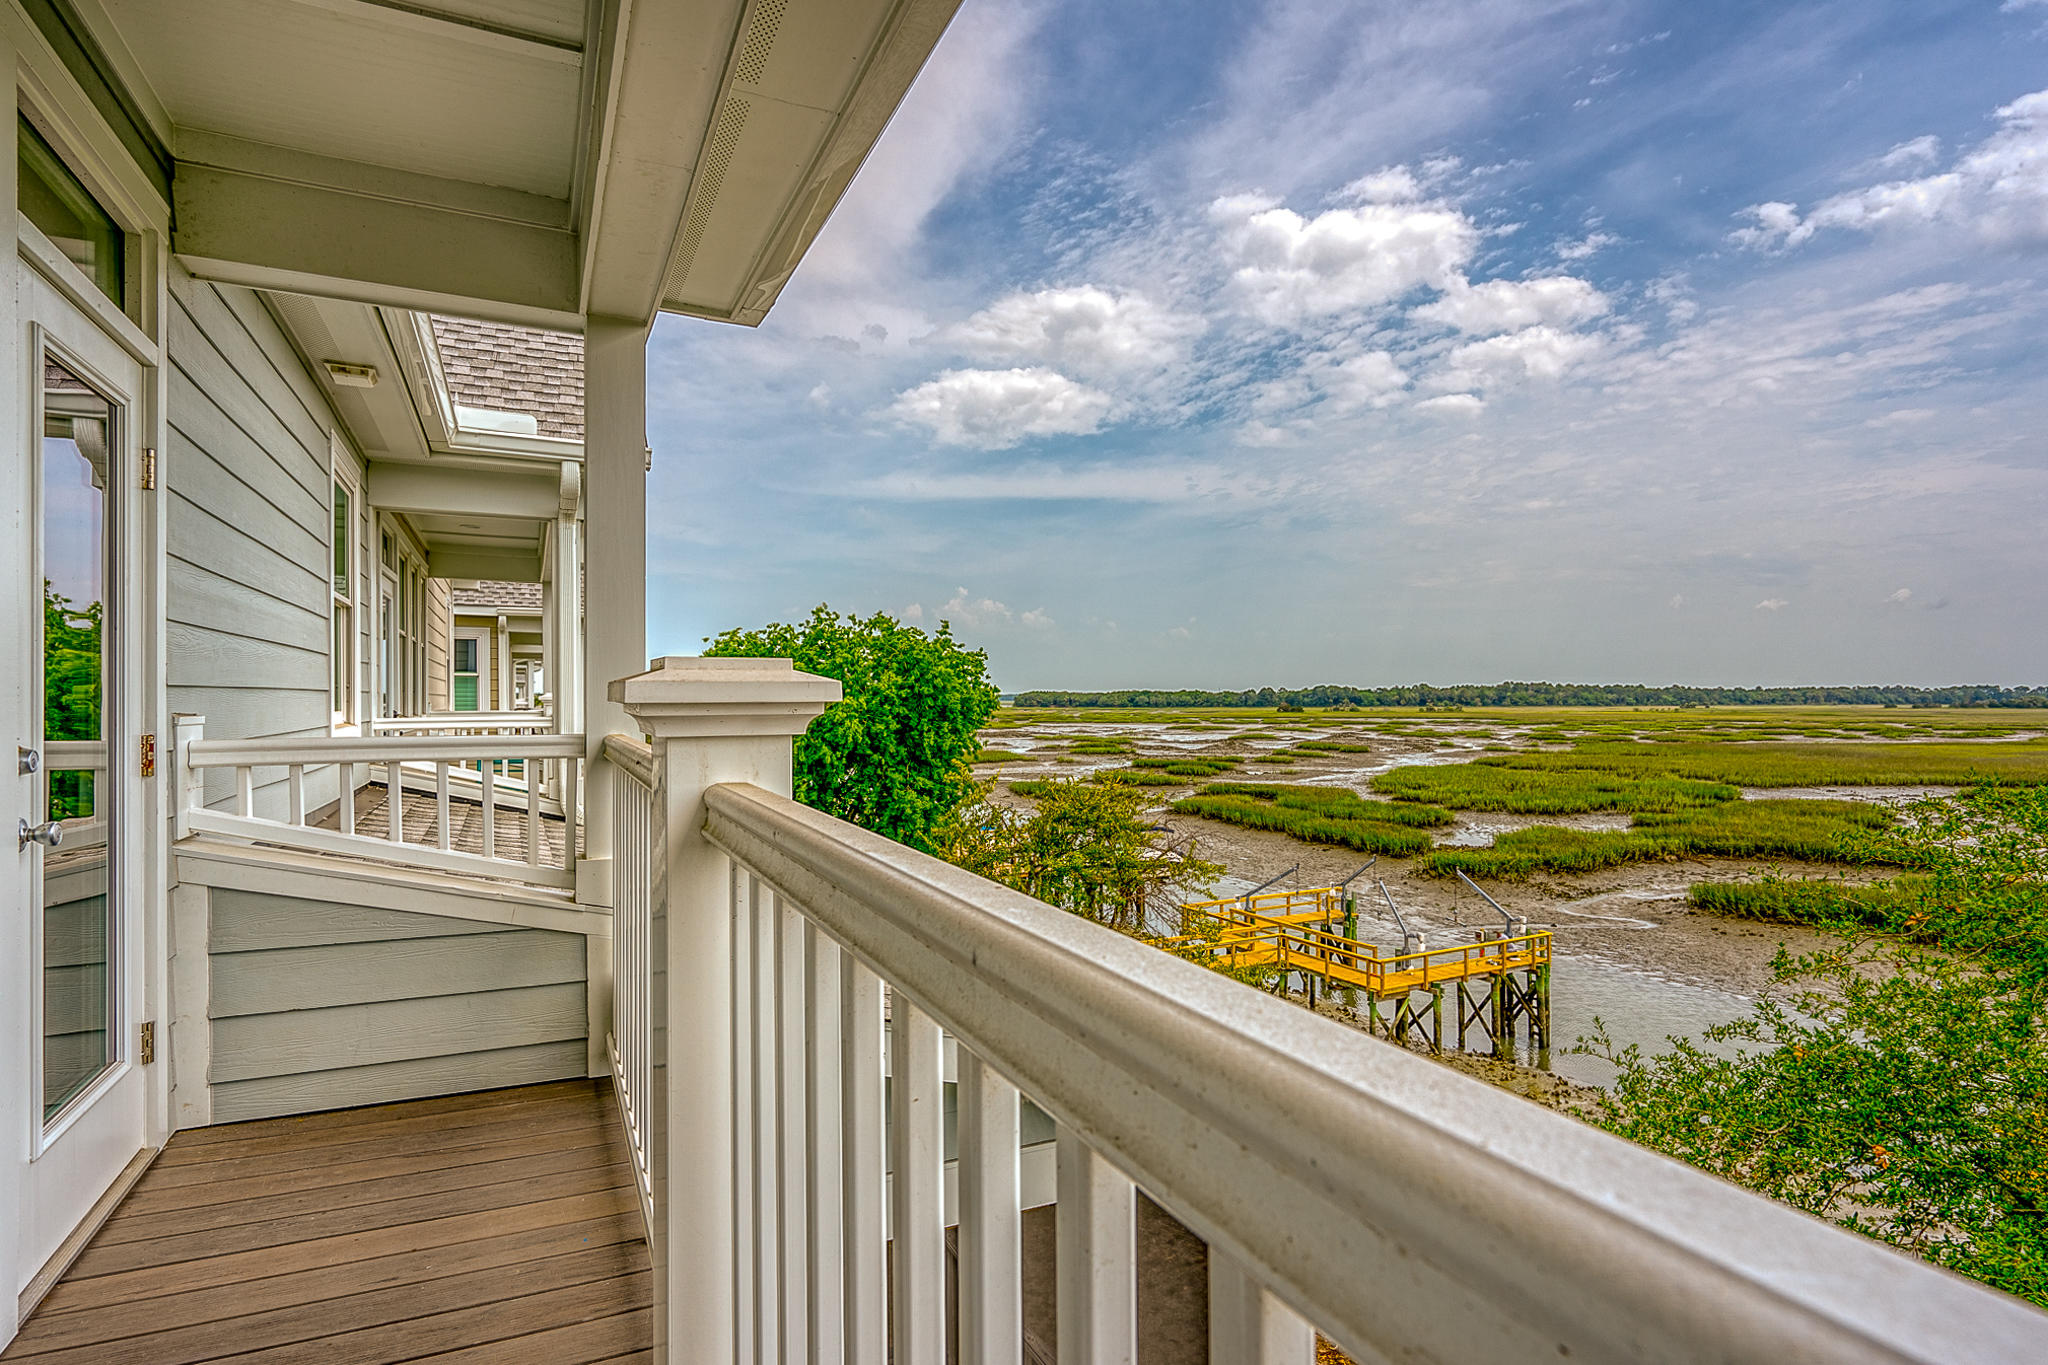 Folly Creek Place Homes For Sale - 2238 Folly Road, Folly Beach, SC - 8